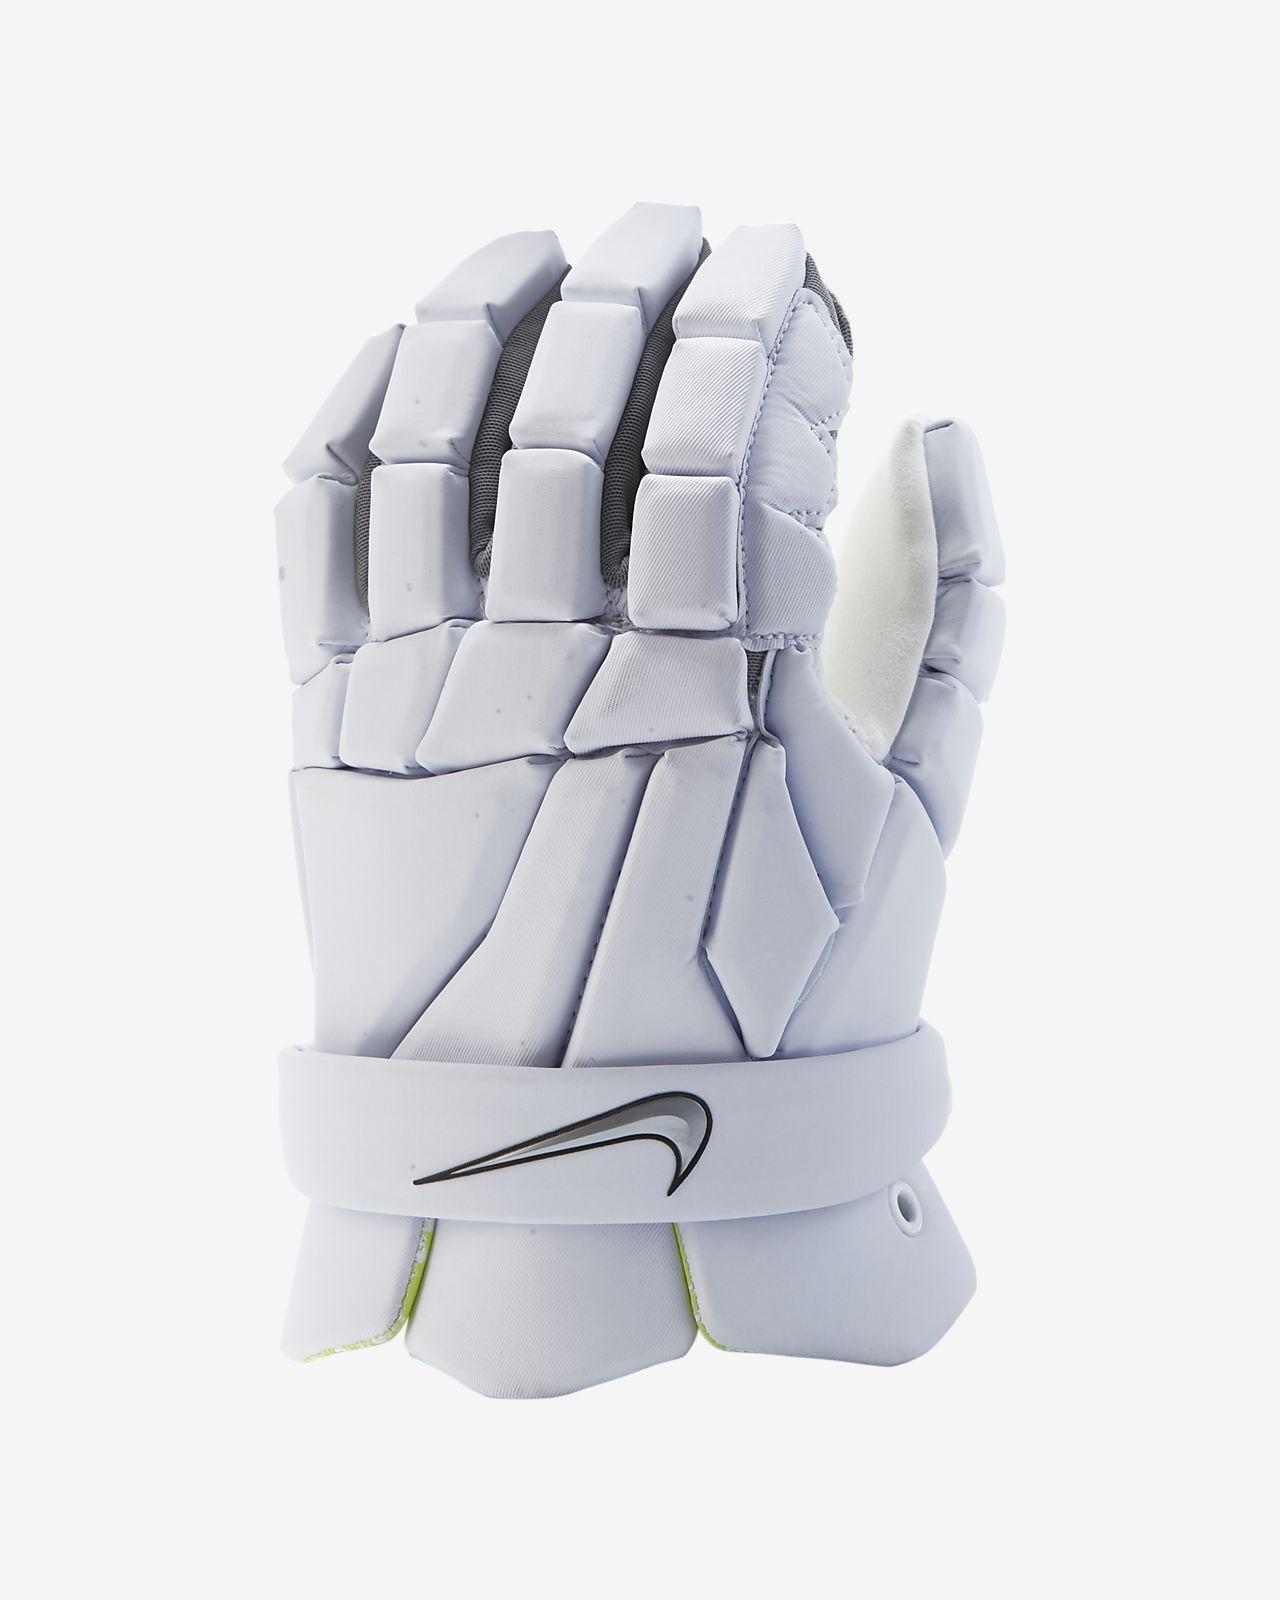 Nike Vapor Pro Men's Lacrosse Gloves